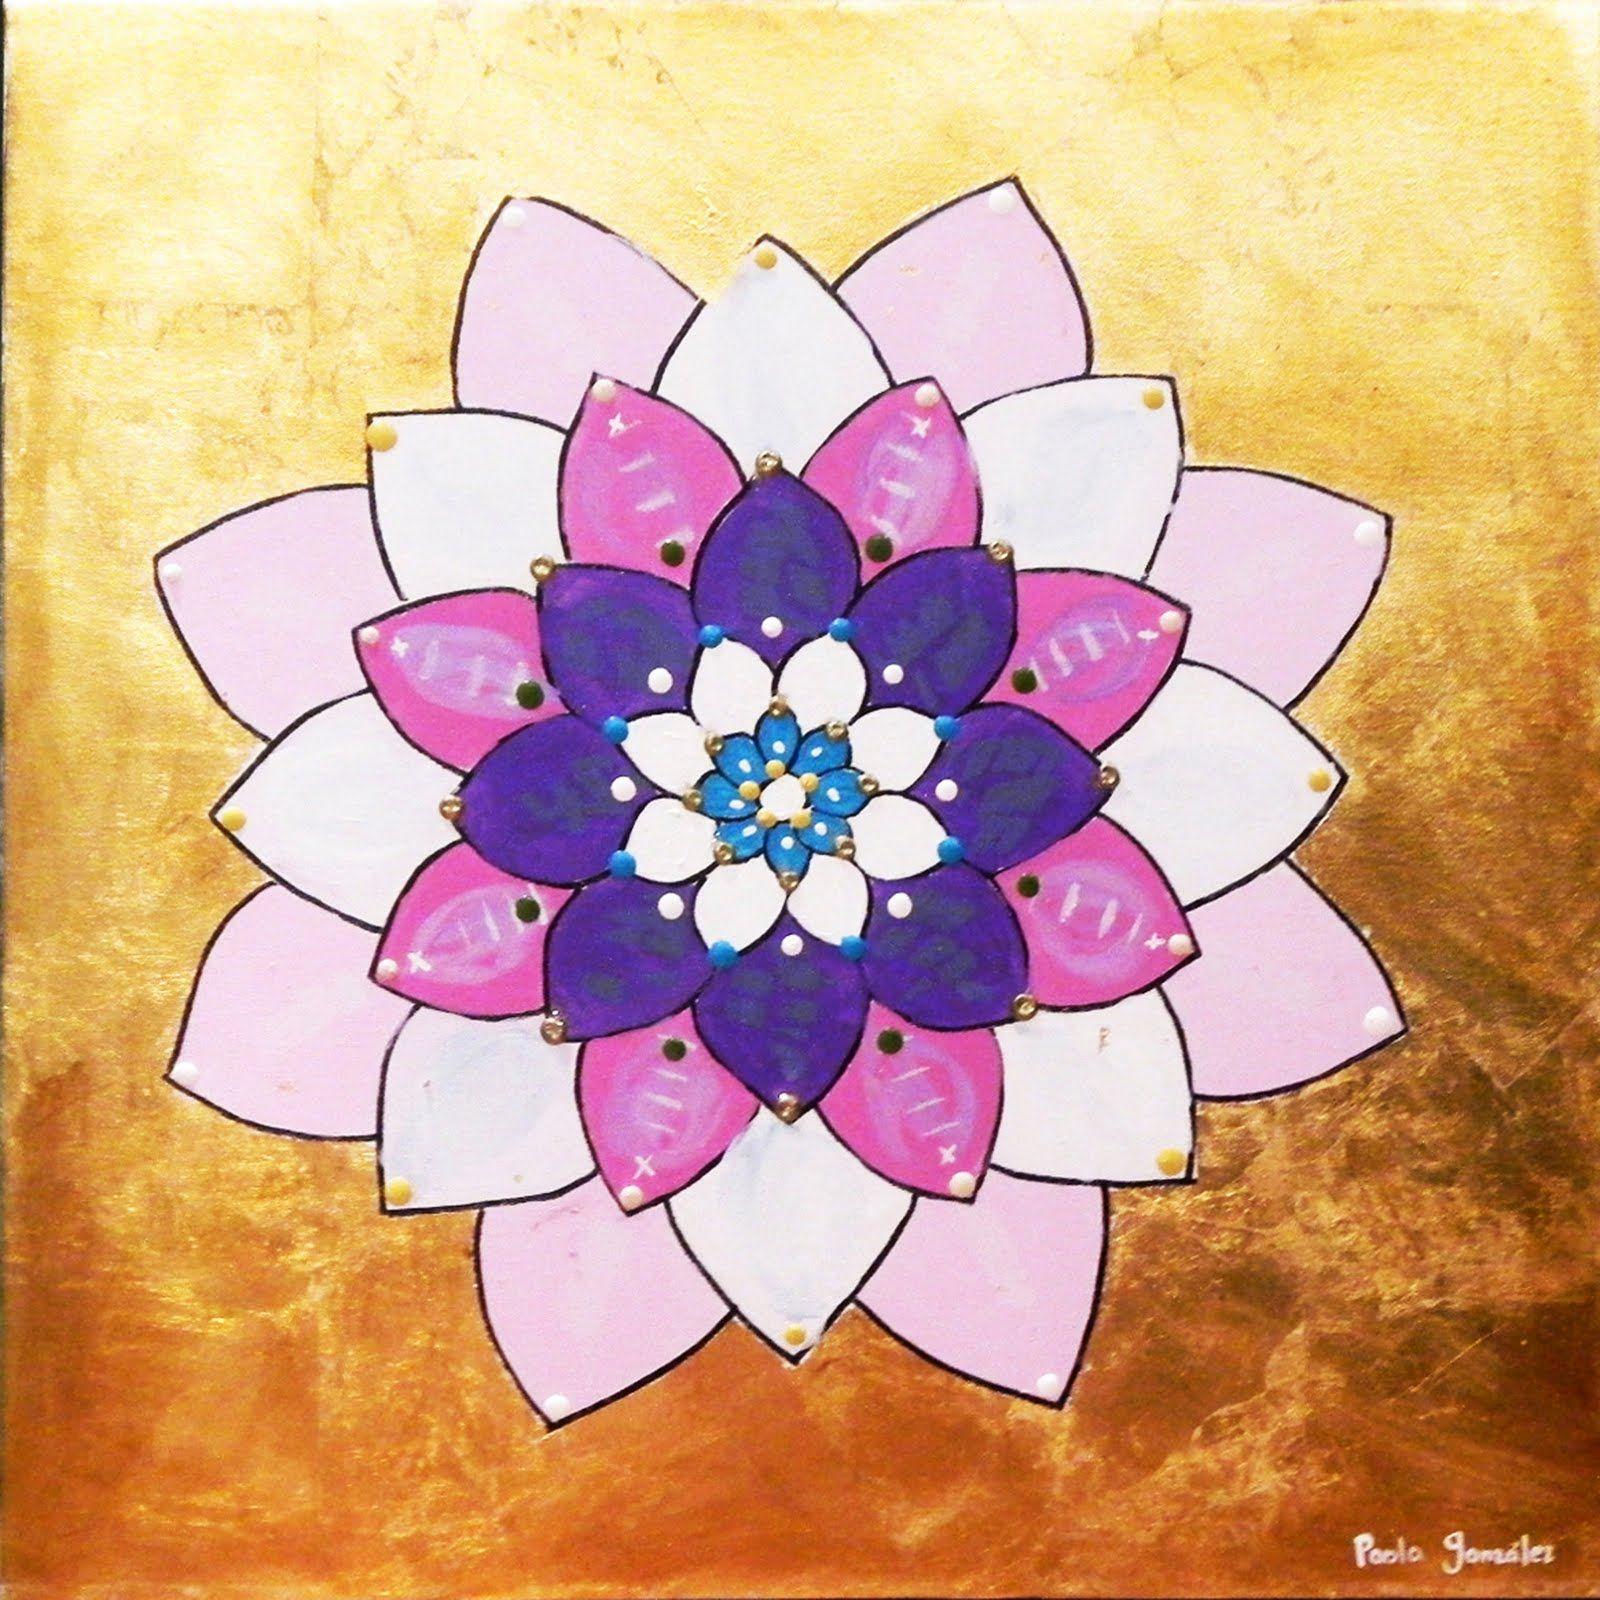 Lotus flower meaning is one of my lotus flowers acrylic over gold lotus flower meaning is one of my lotus flowers acrylic over gold leaf lotus flower izmirmasajfo